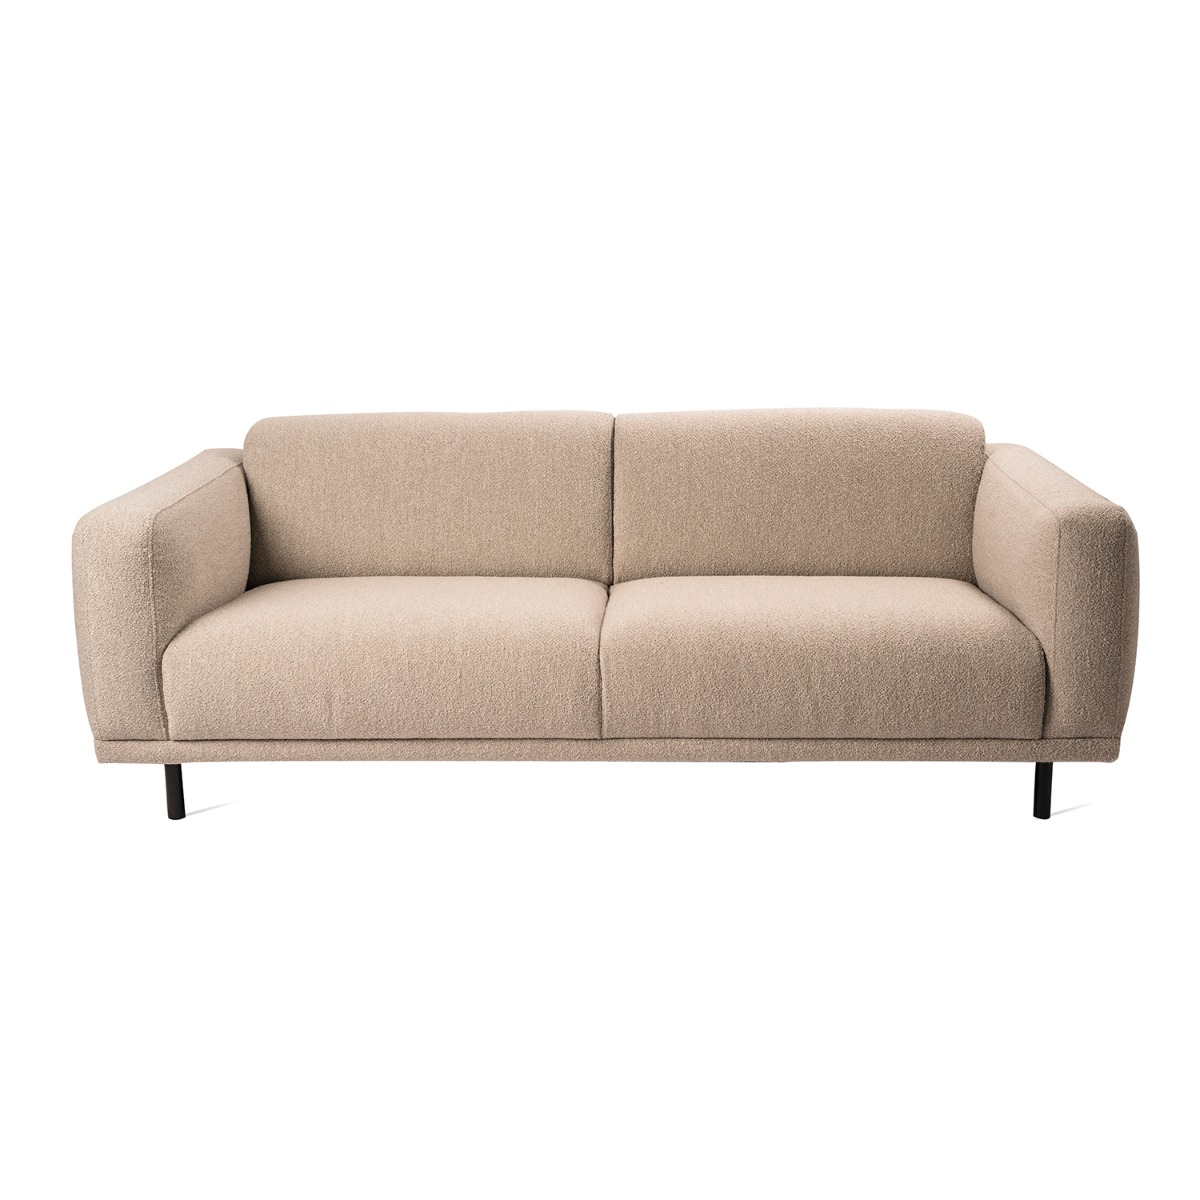 Teddy sofa Pols Potten - Beige